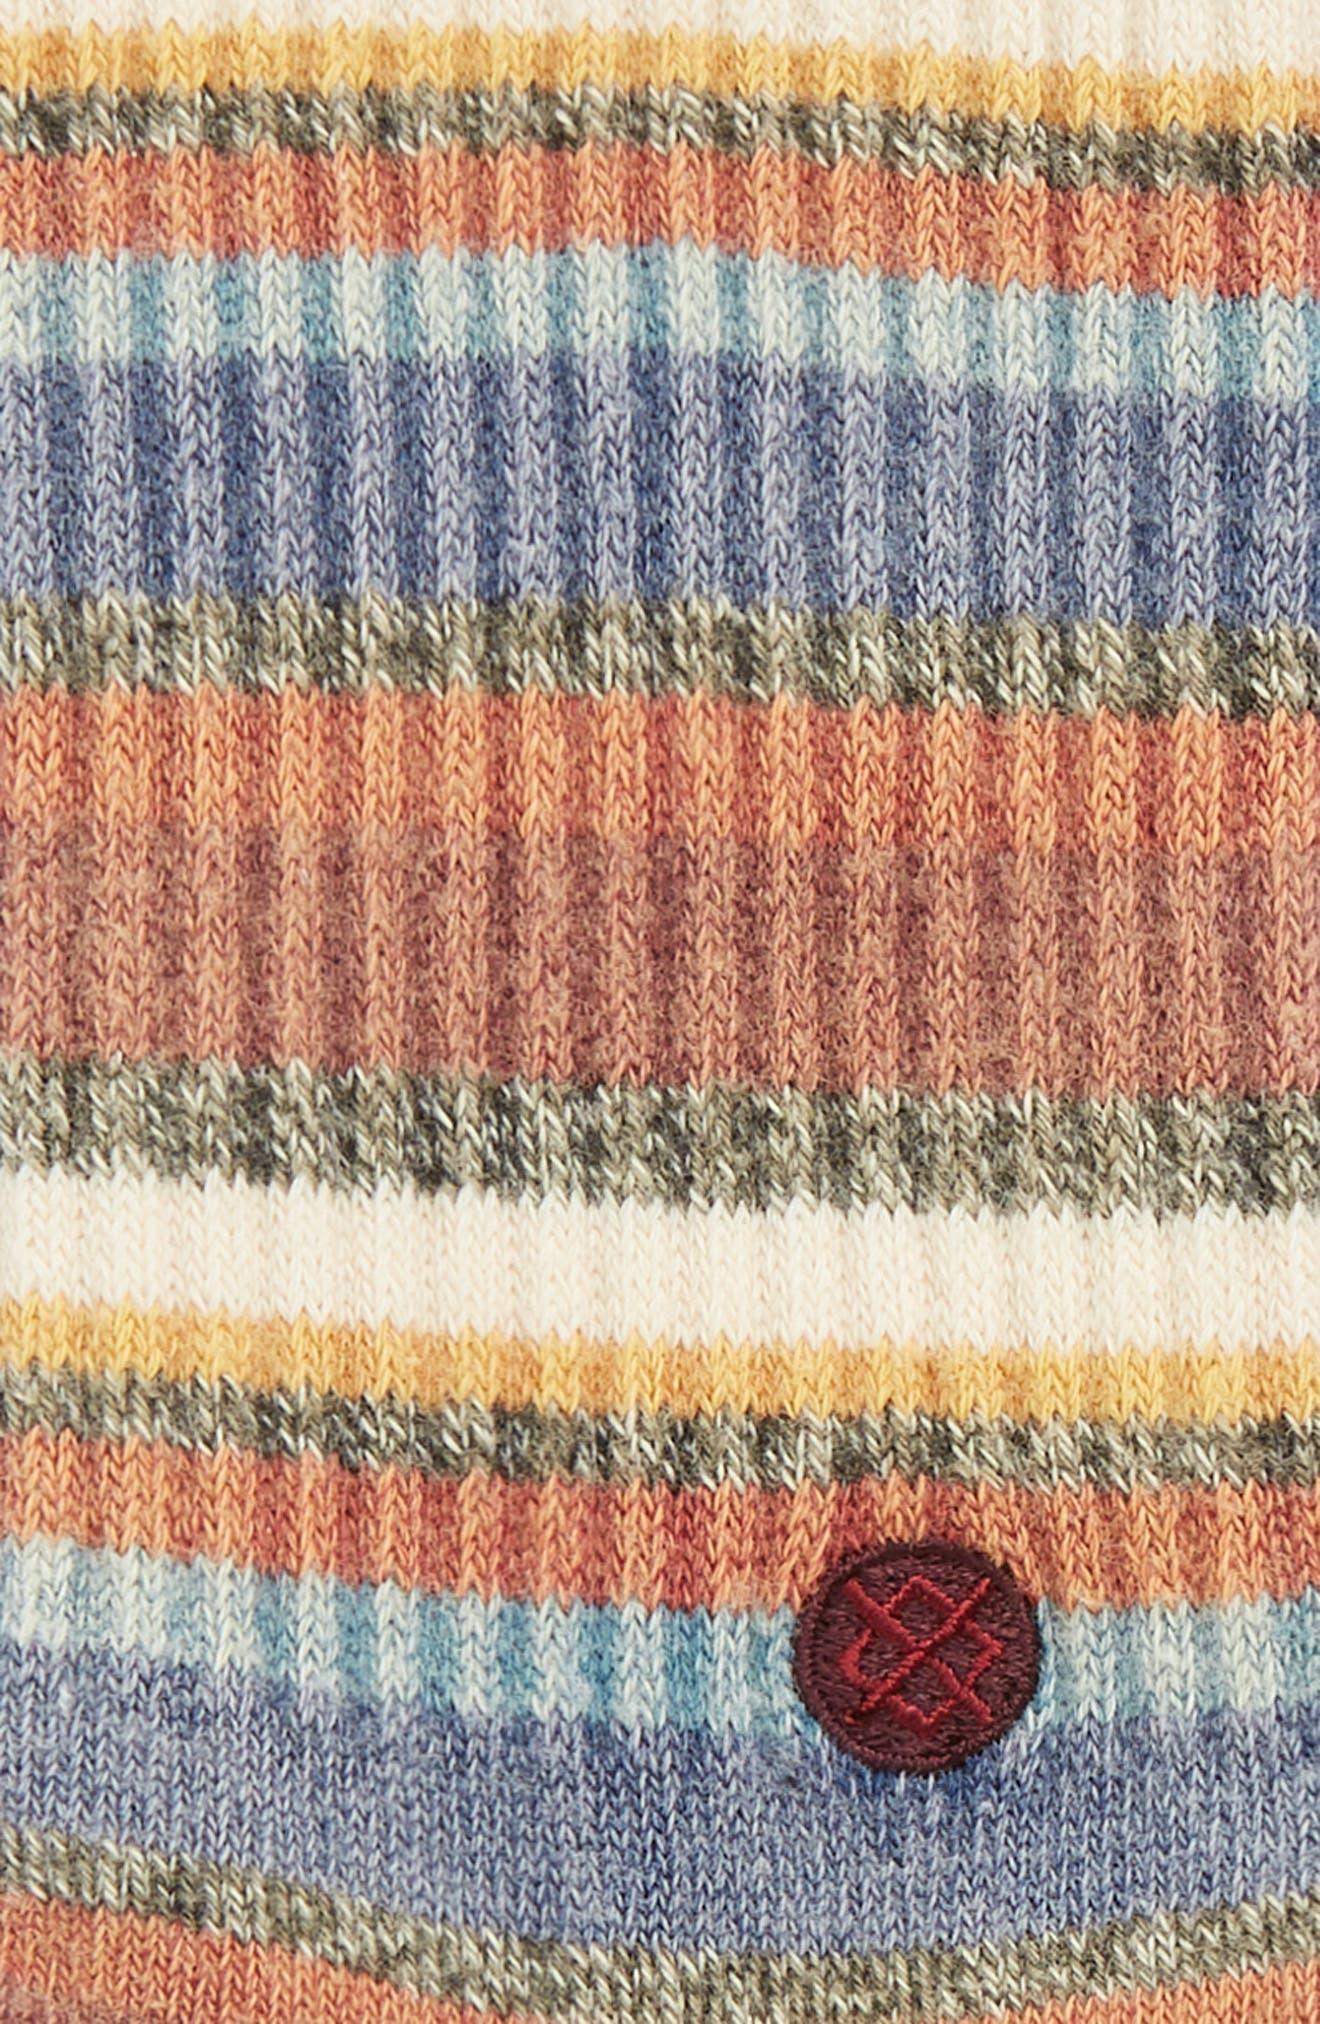 Riot Striped Socks,                             Alternate thumbnail 2, color,                             MAROON